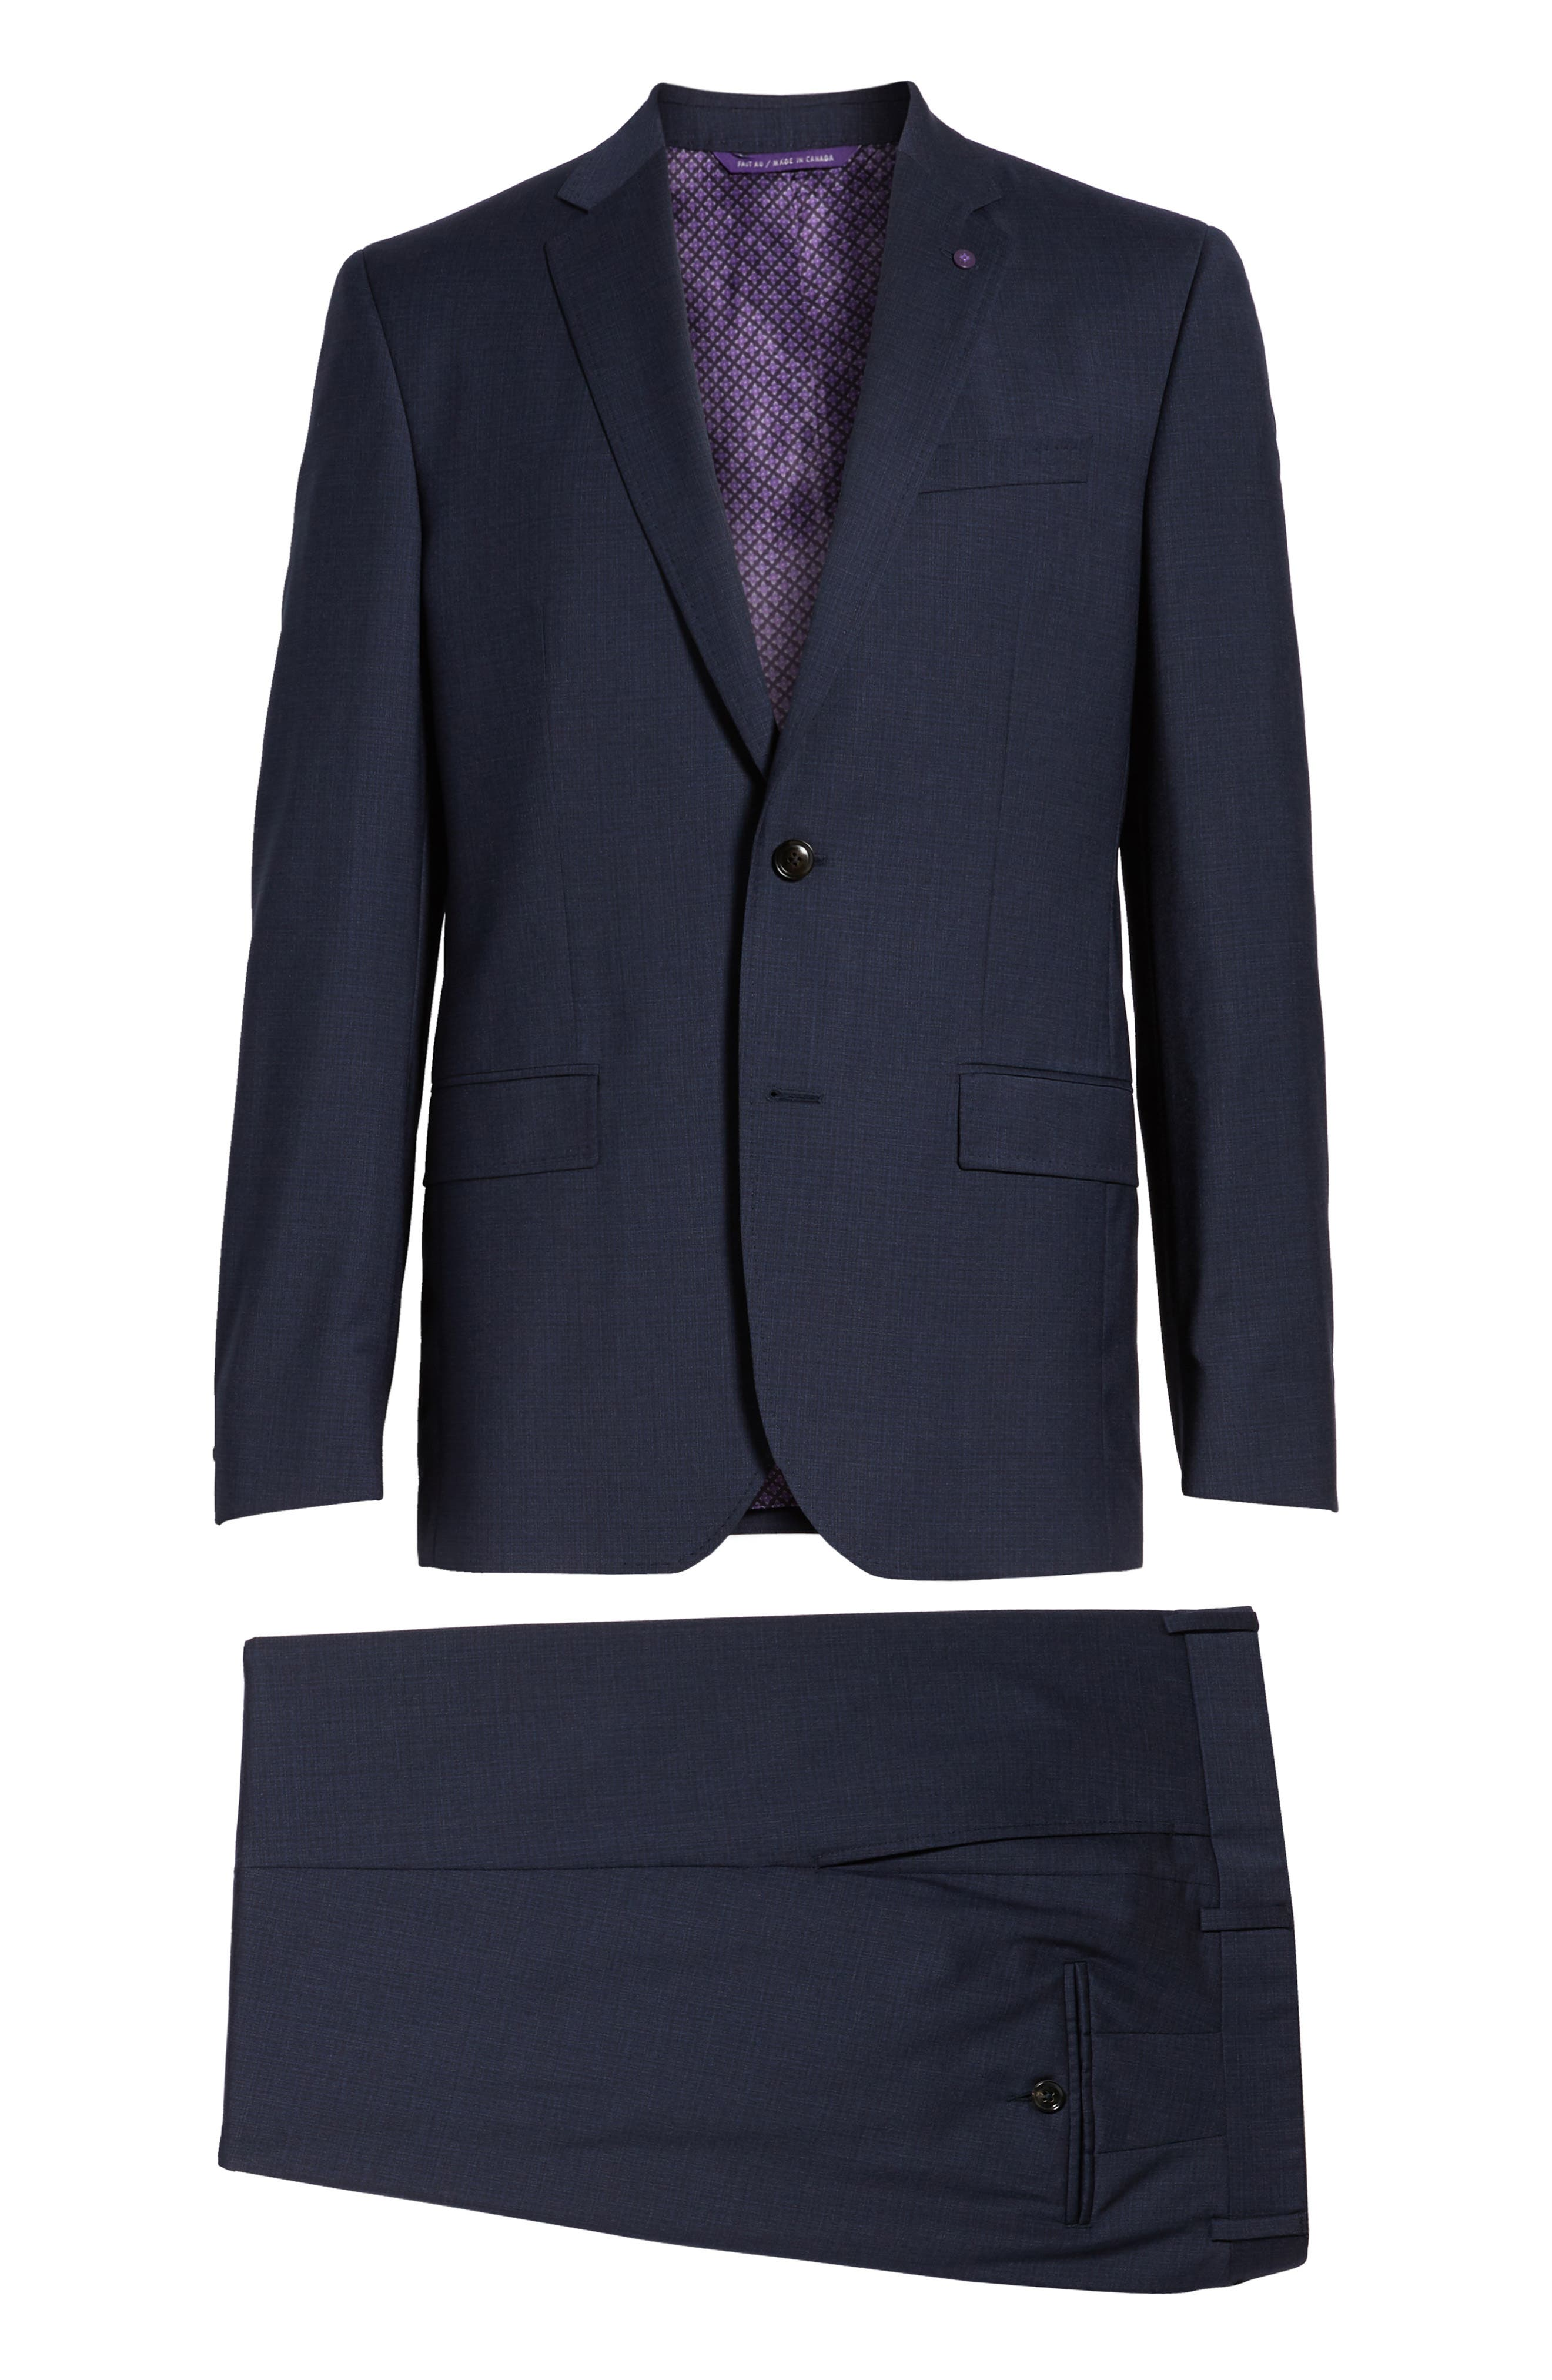 Jay Trim Fit Solid Wool Suit,                             Alternate thumbnail 8, color,                             BLUE